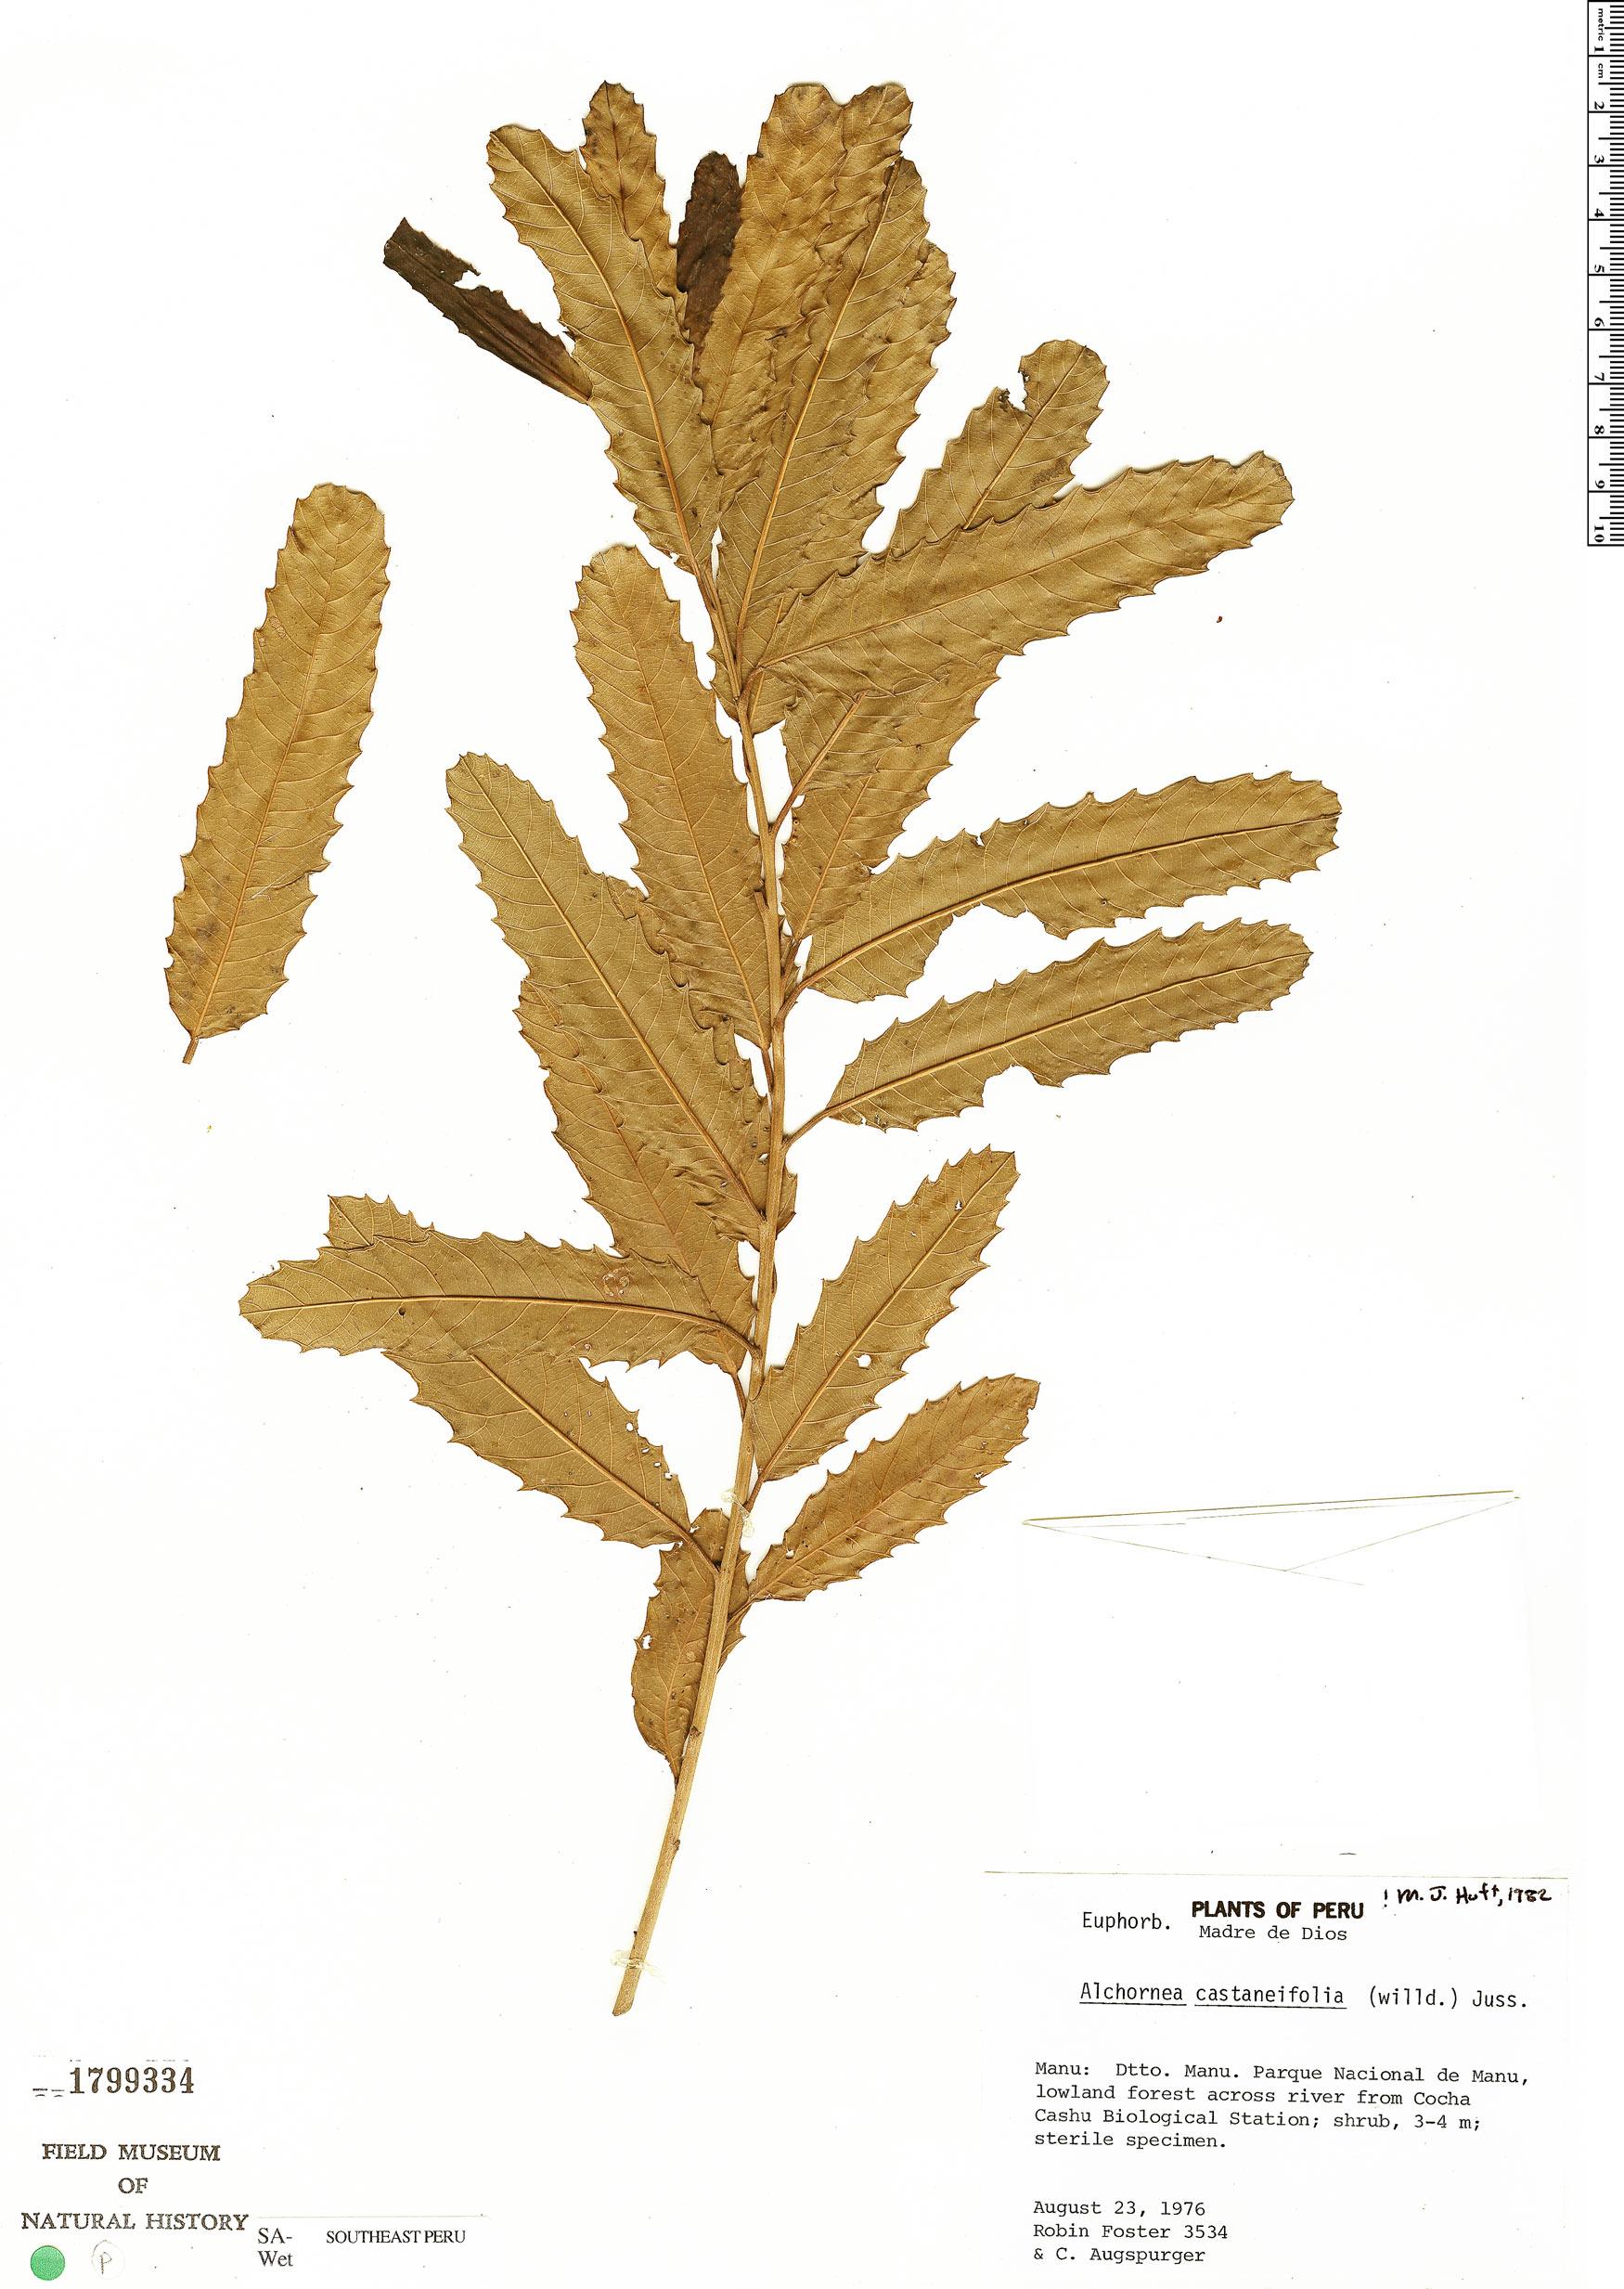 Specimen: Alchornea castaneifolia